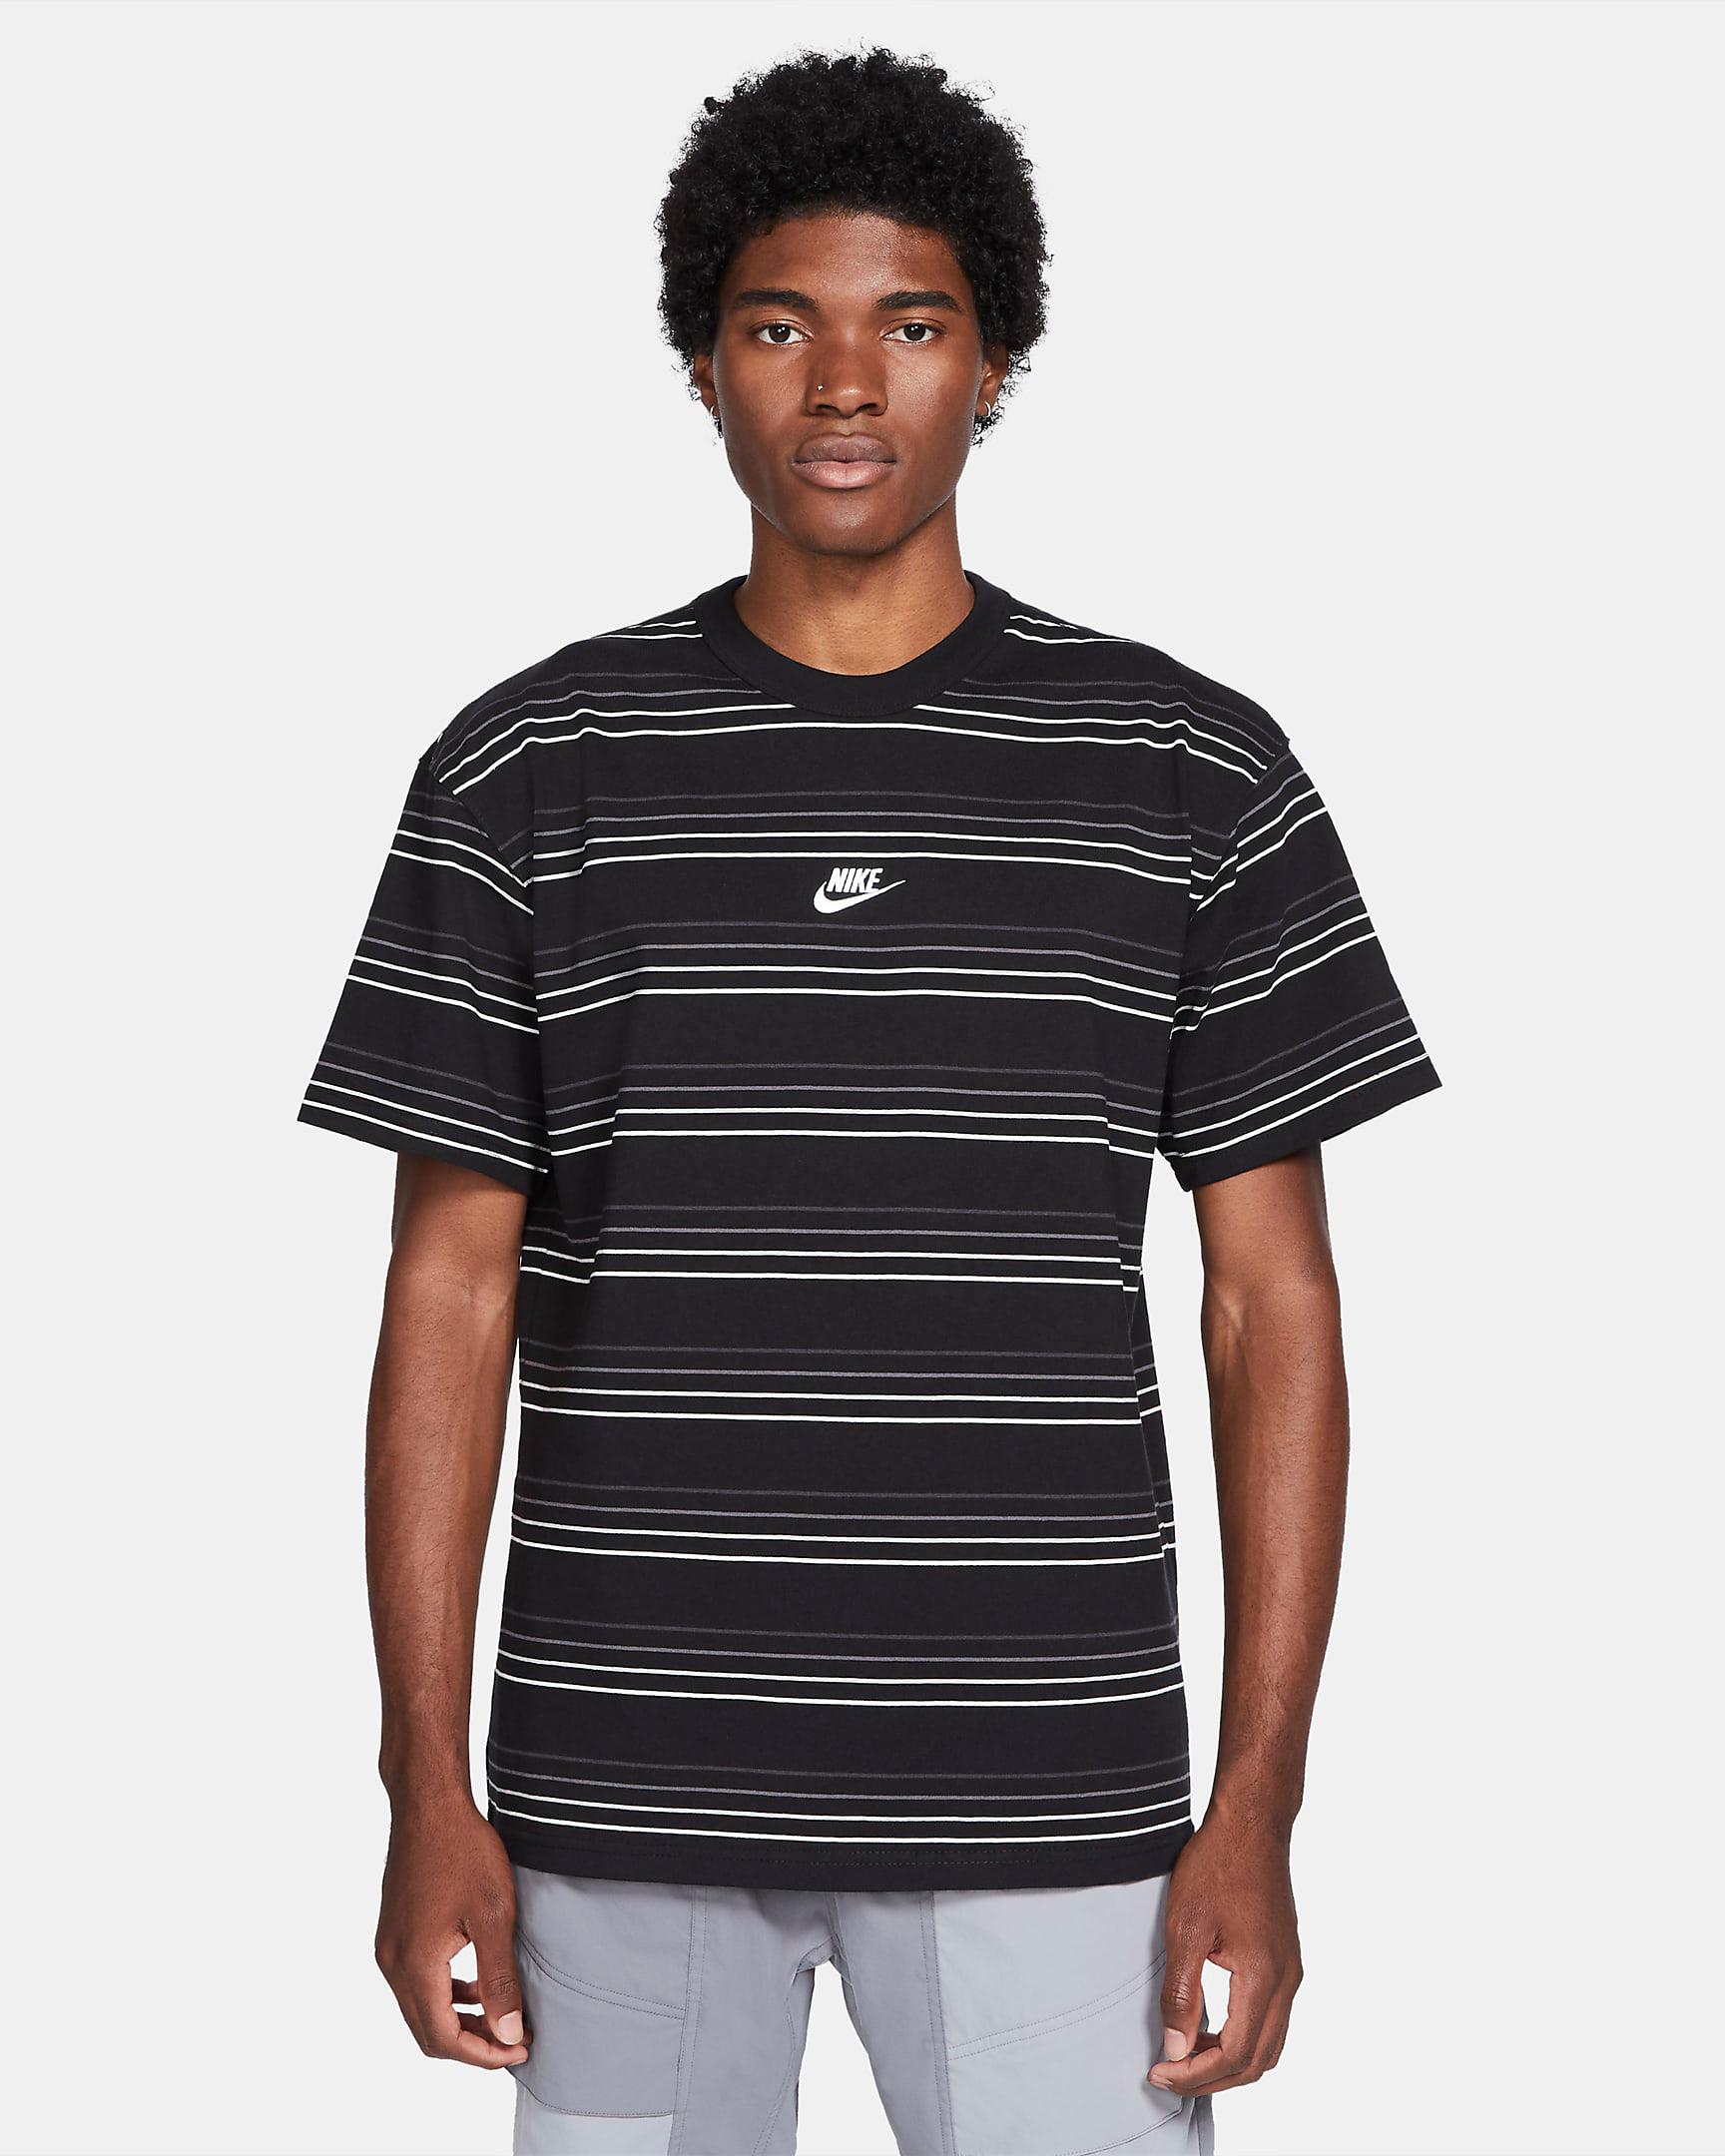 nike-sportswear-max-90-striped-shirt-black